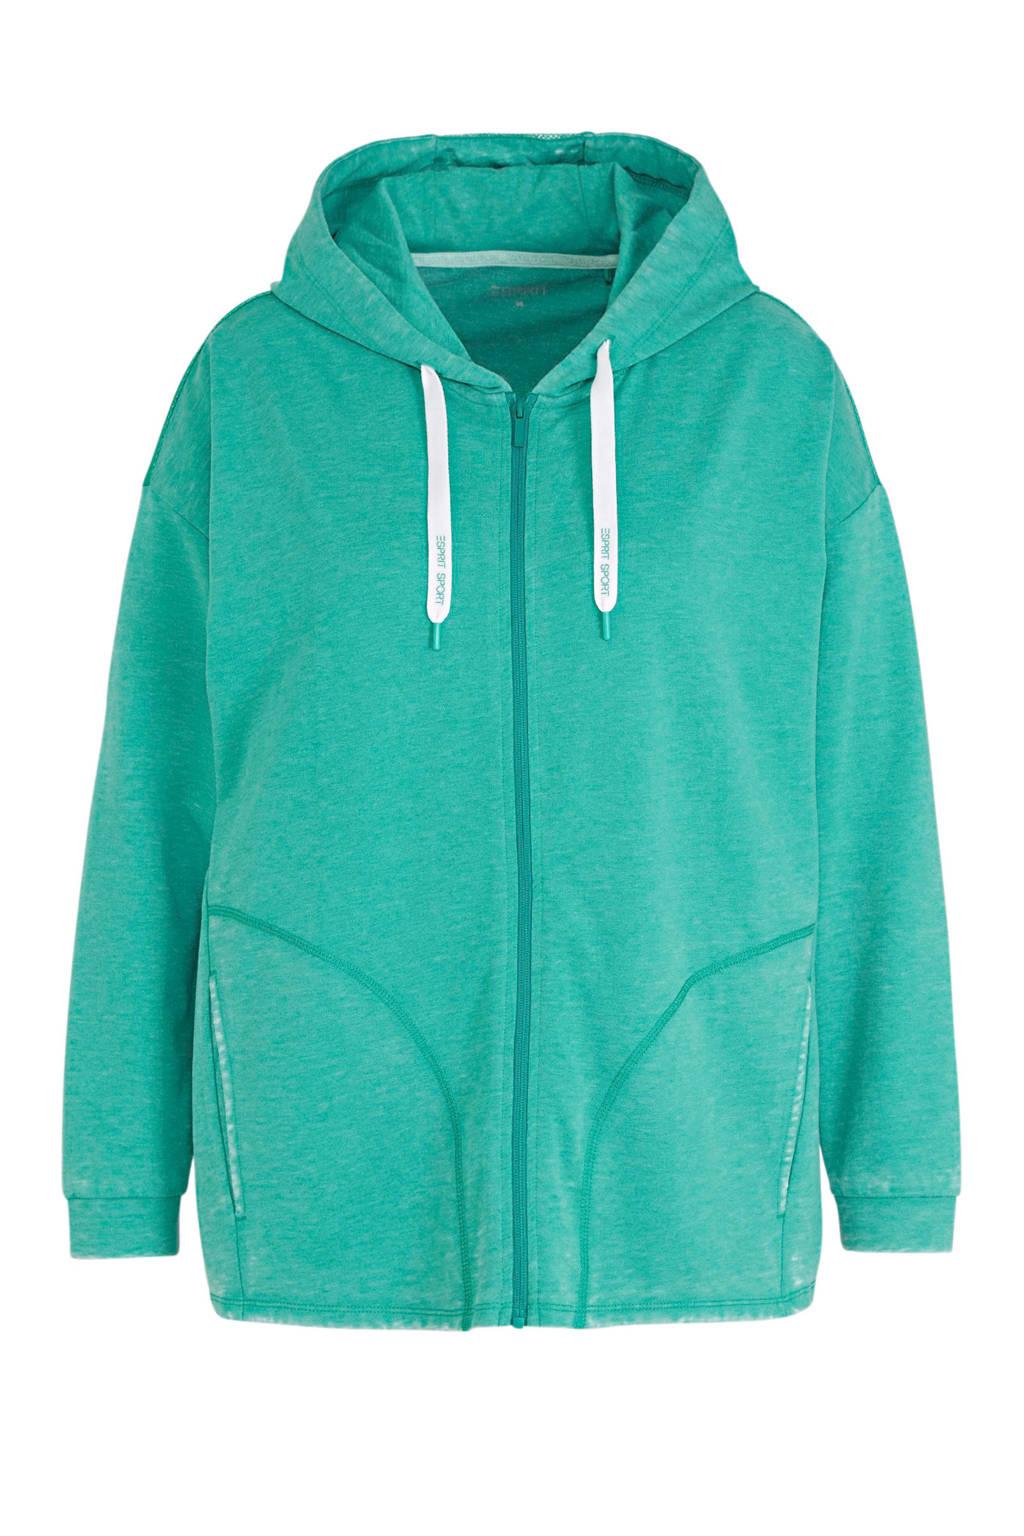 ESPRIT Women Sports Plus Size sportvest turquoise, Turquoise/wit